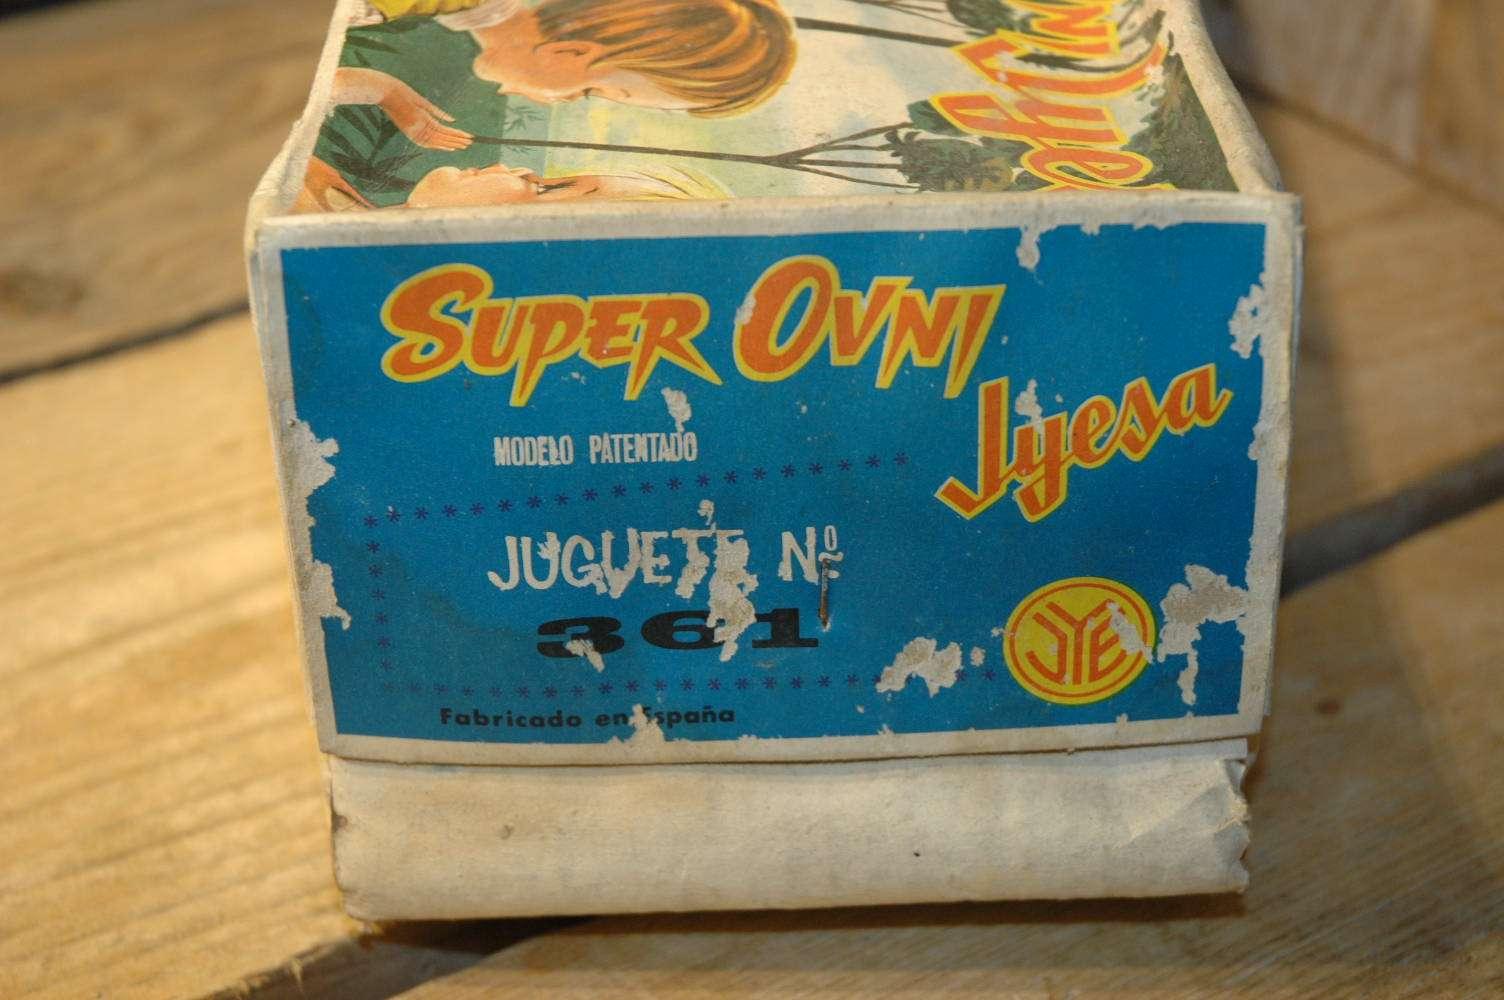 EGE - Juguete - Super Onvi Jyesa